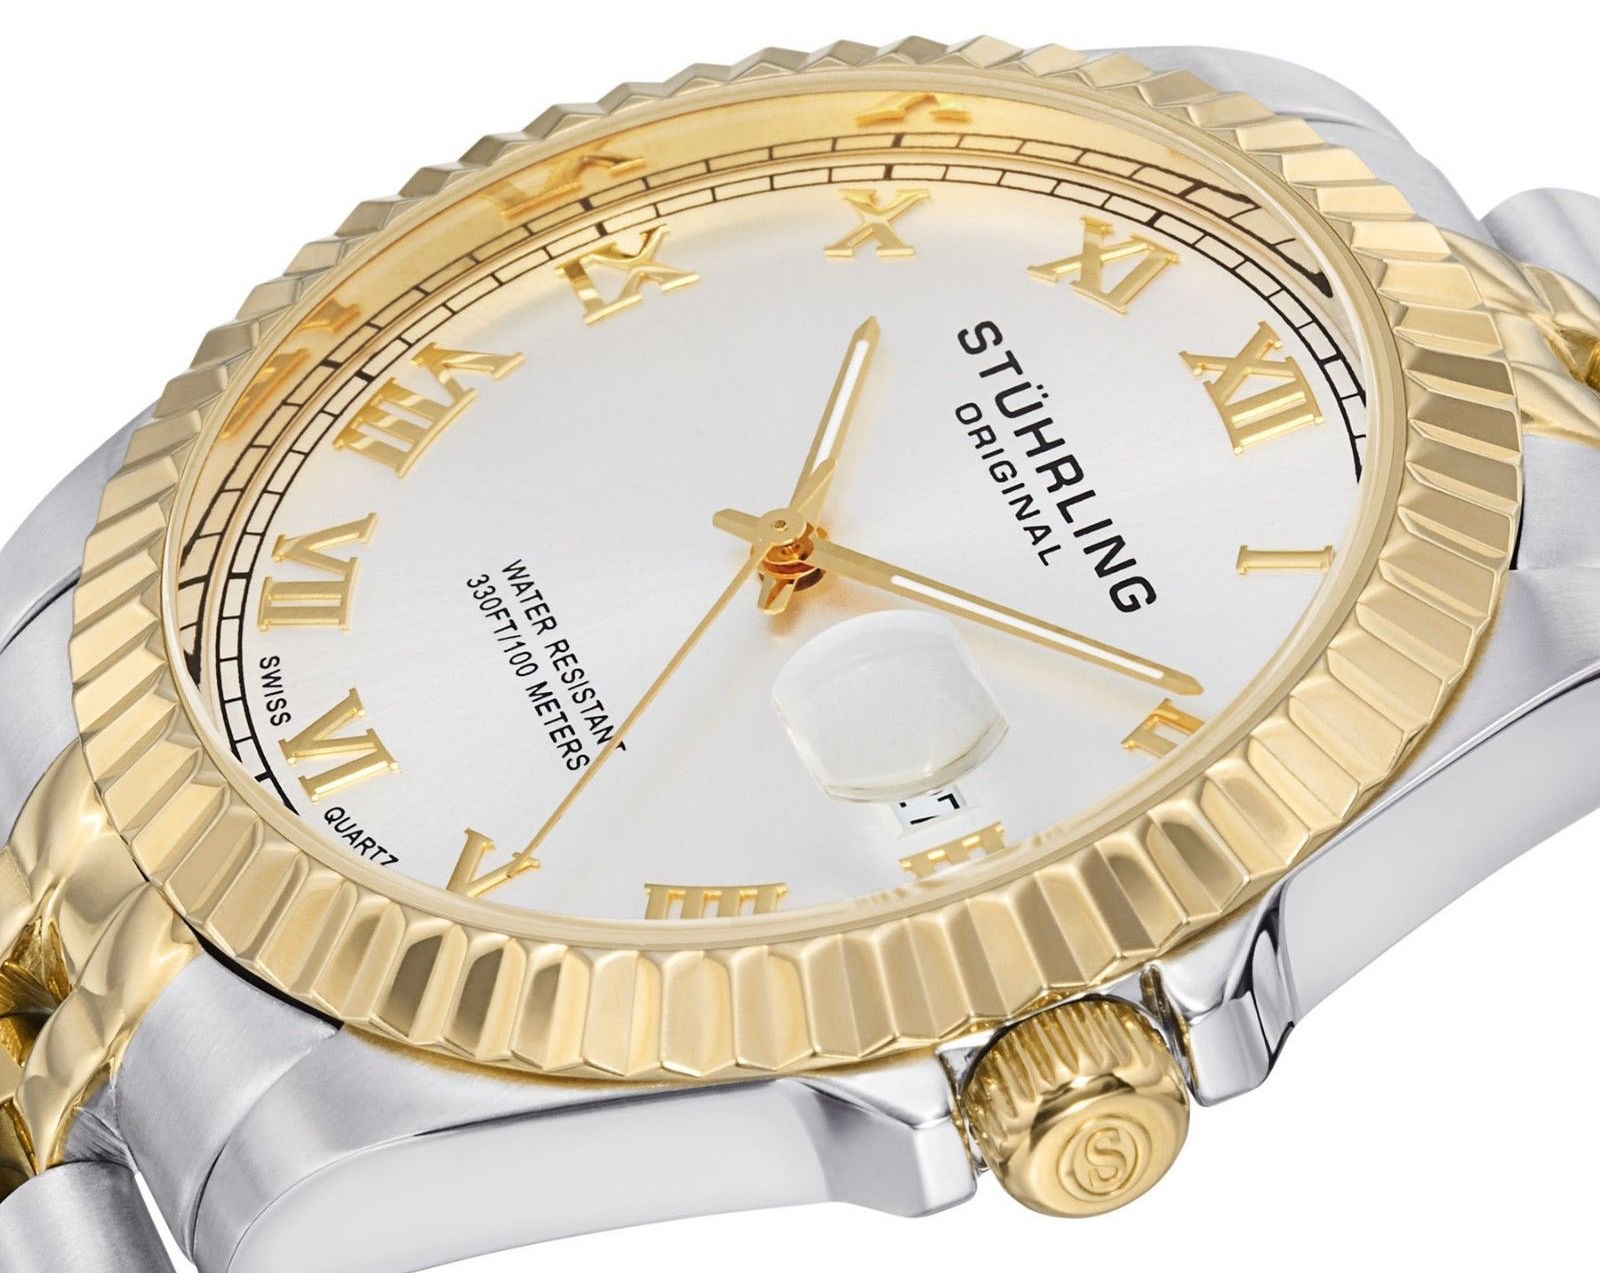 Stuhrling Original 599G.04 Analog Watch Review